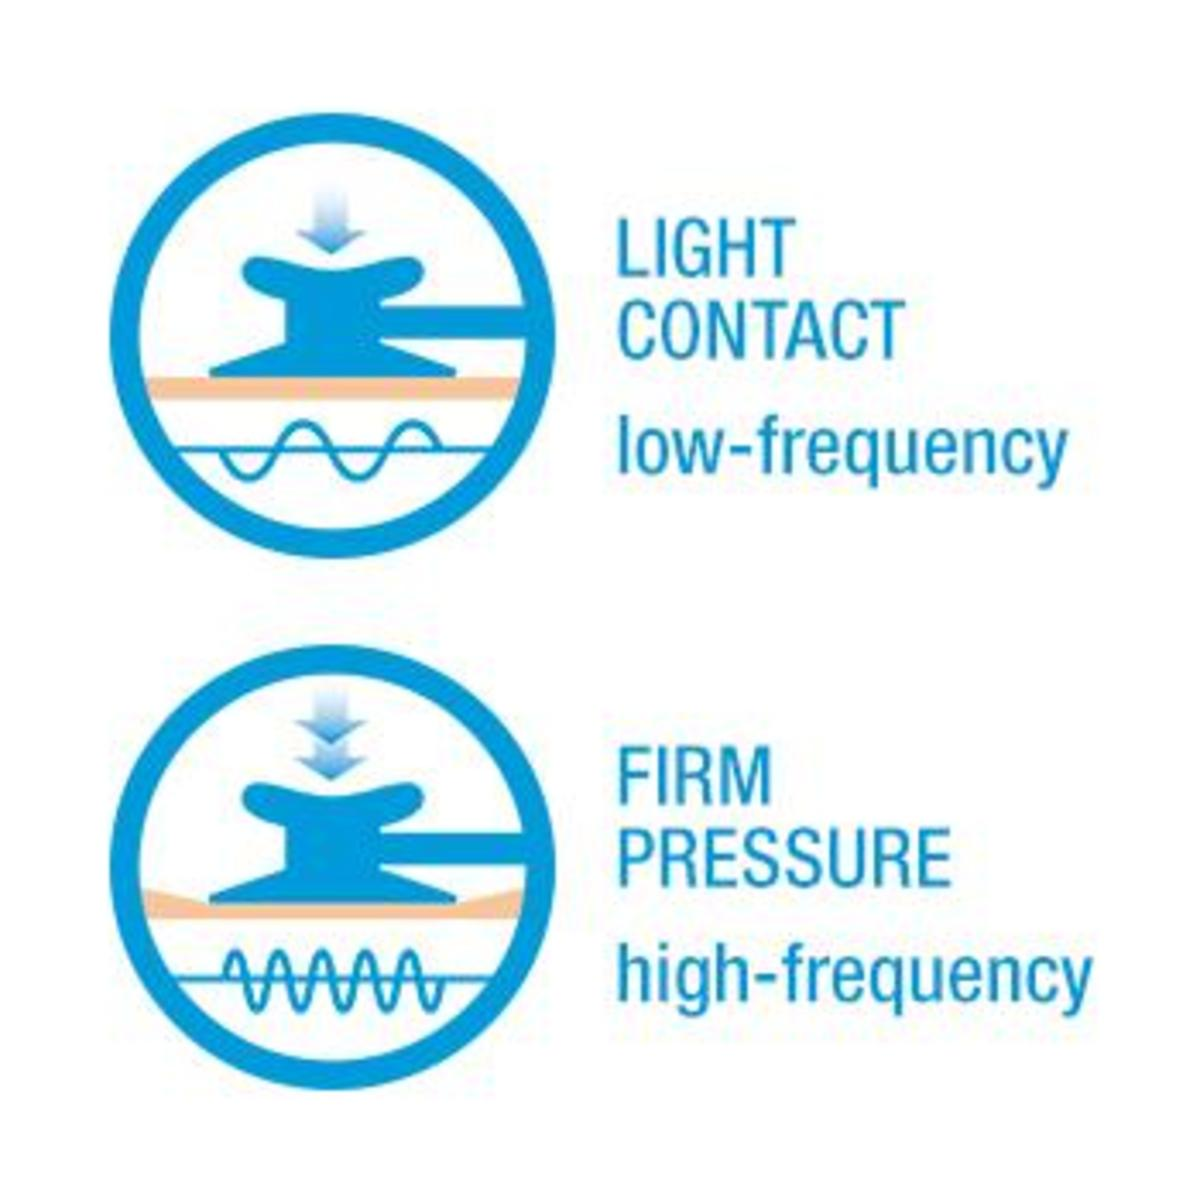 Pressure-sensitive tunable diaphragm